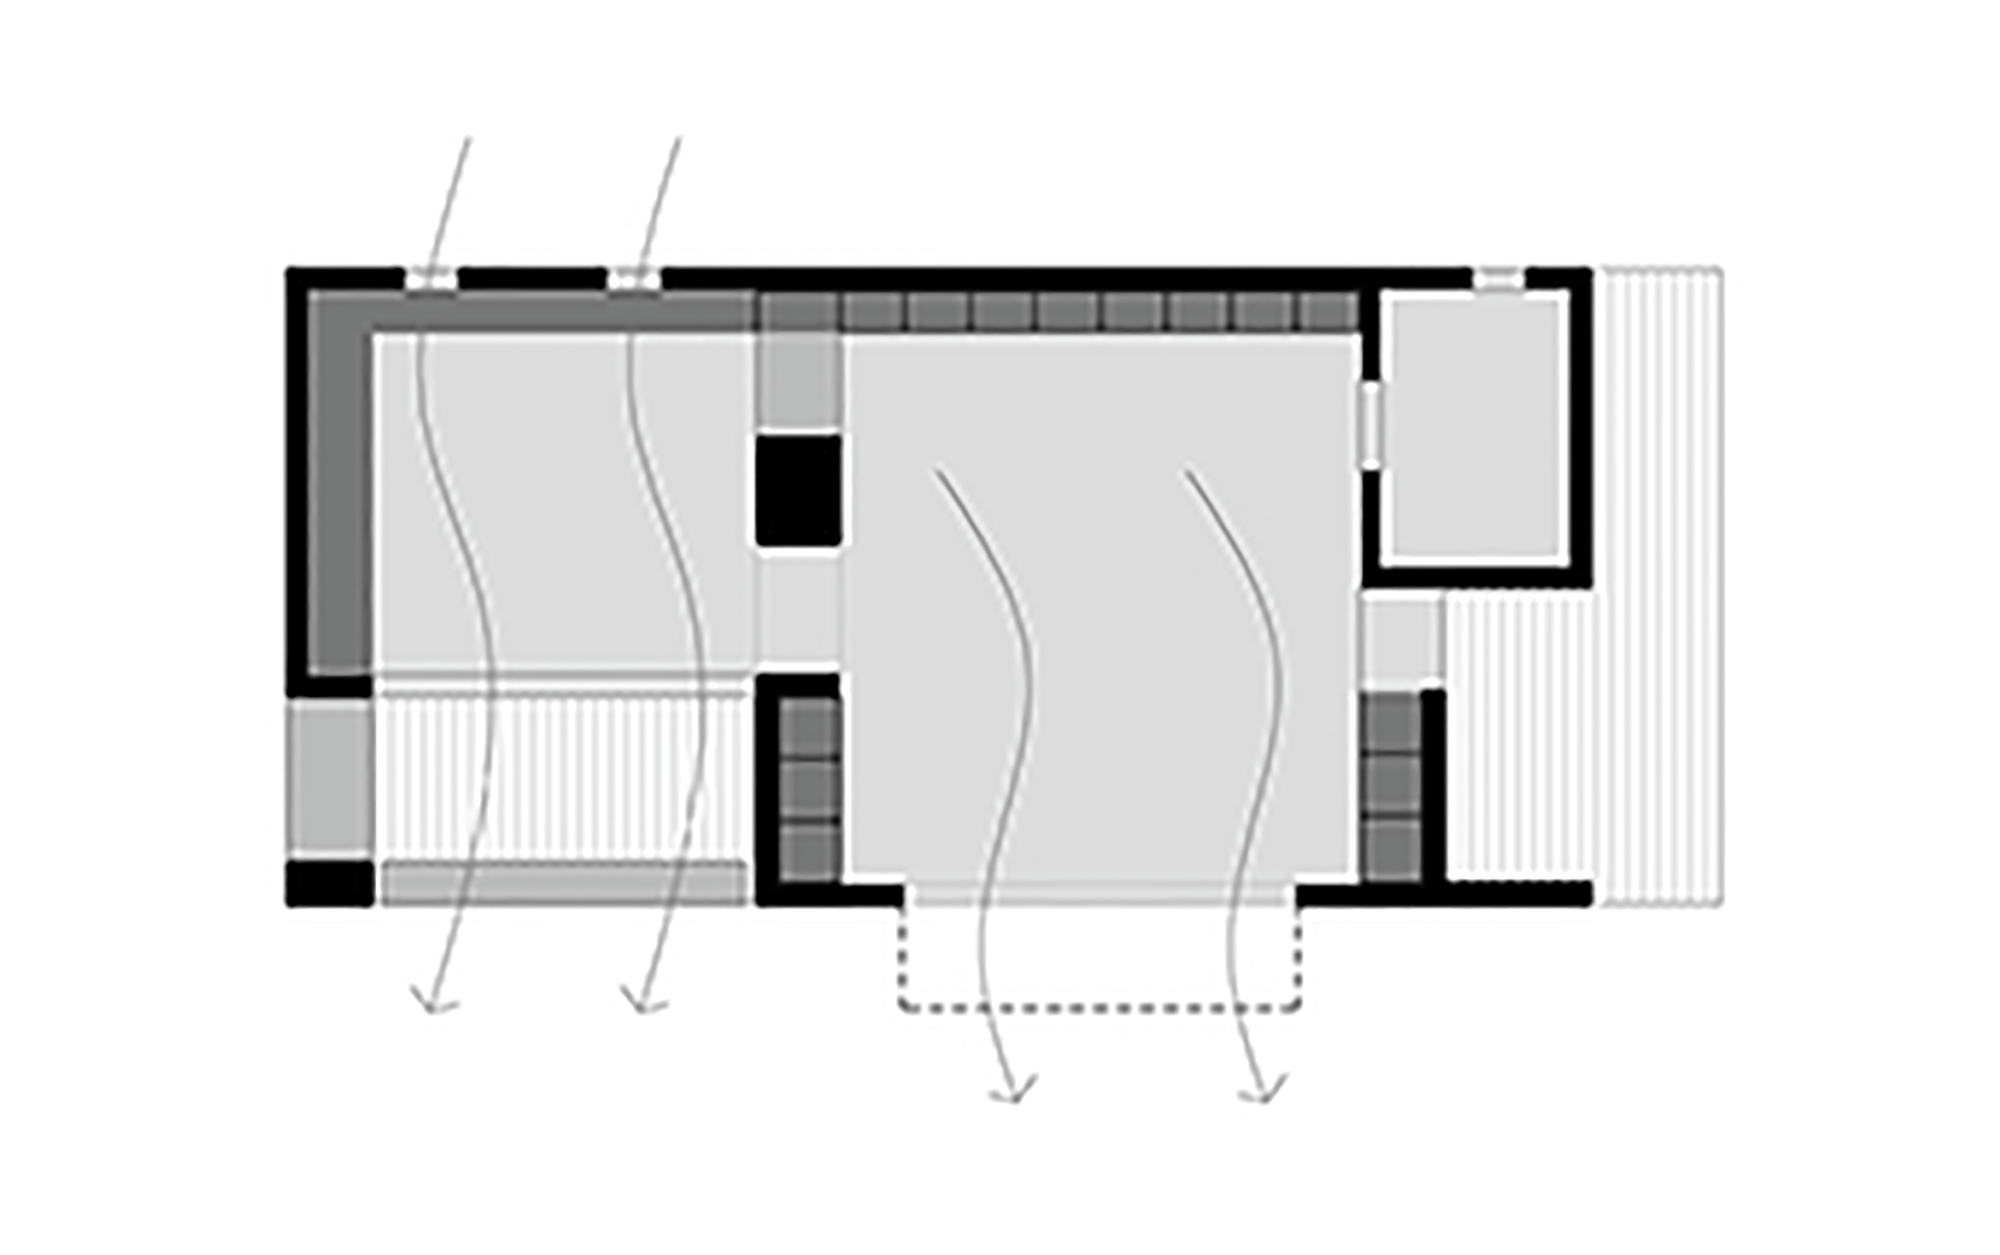 Galeria de est dio de madeira dom arquitectura 16 for Arq estudio de arquitectura